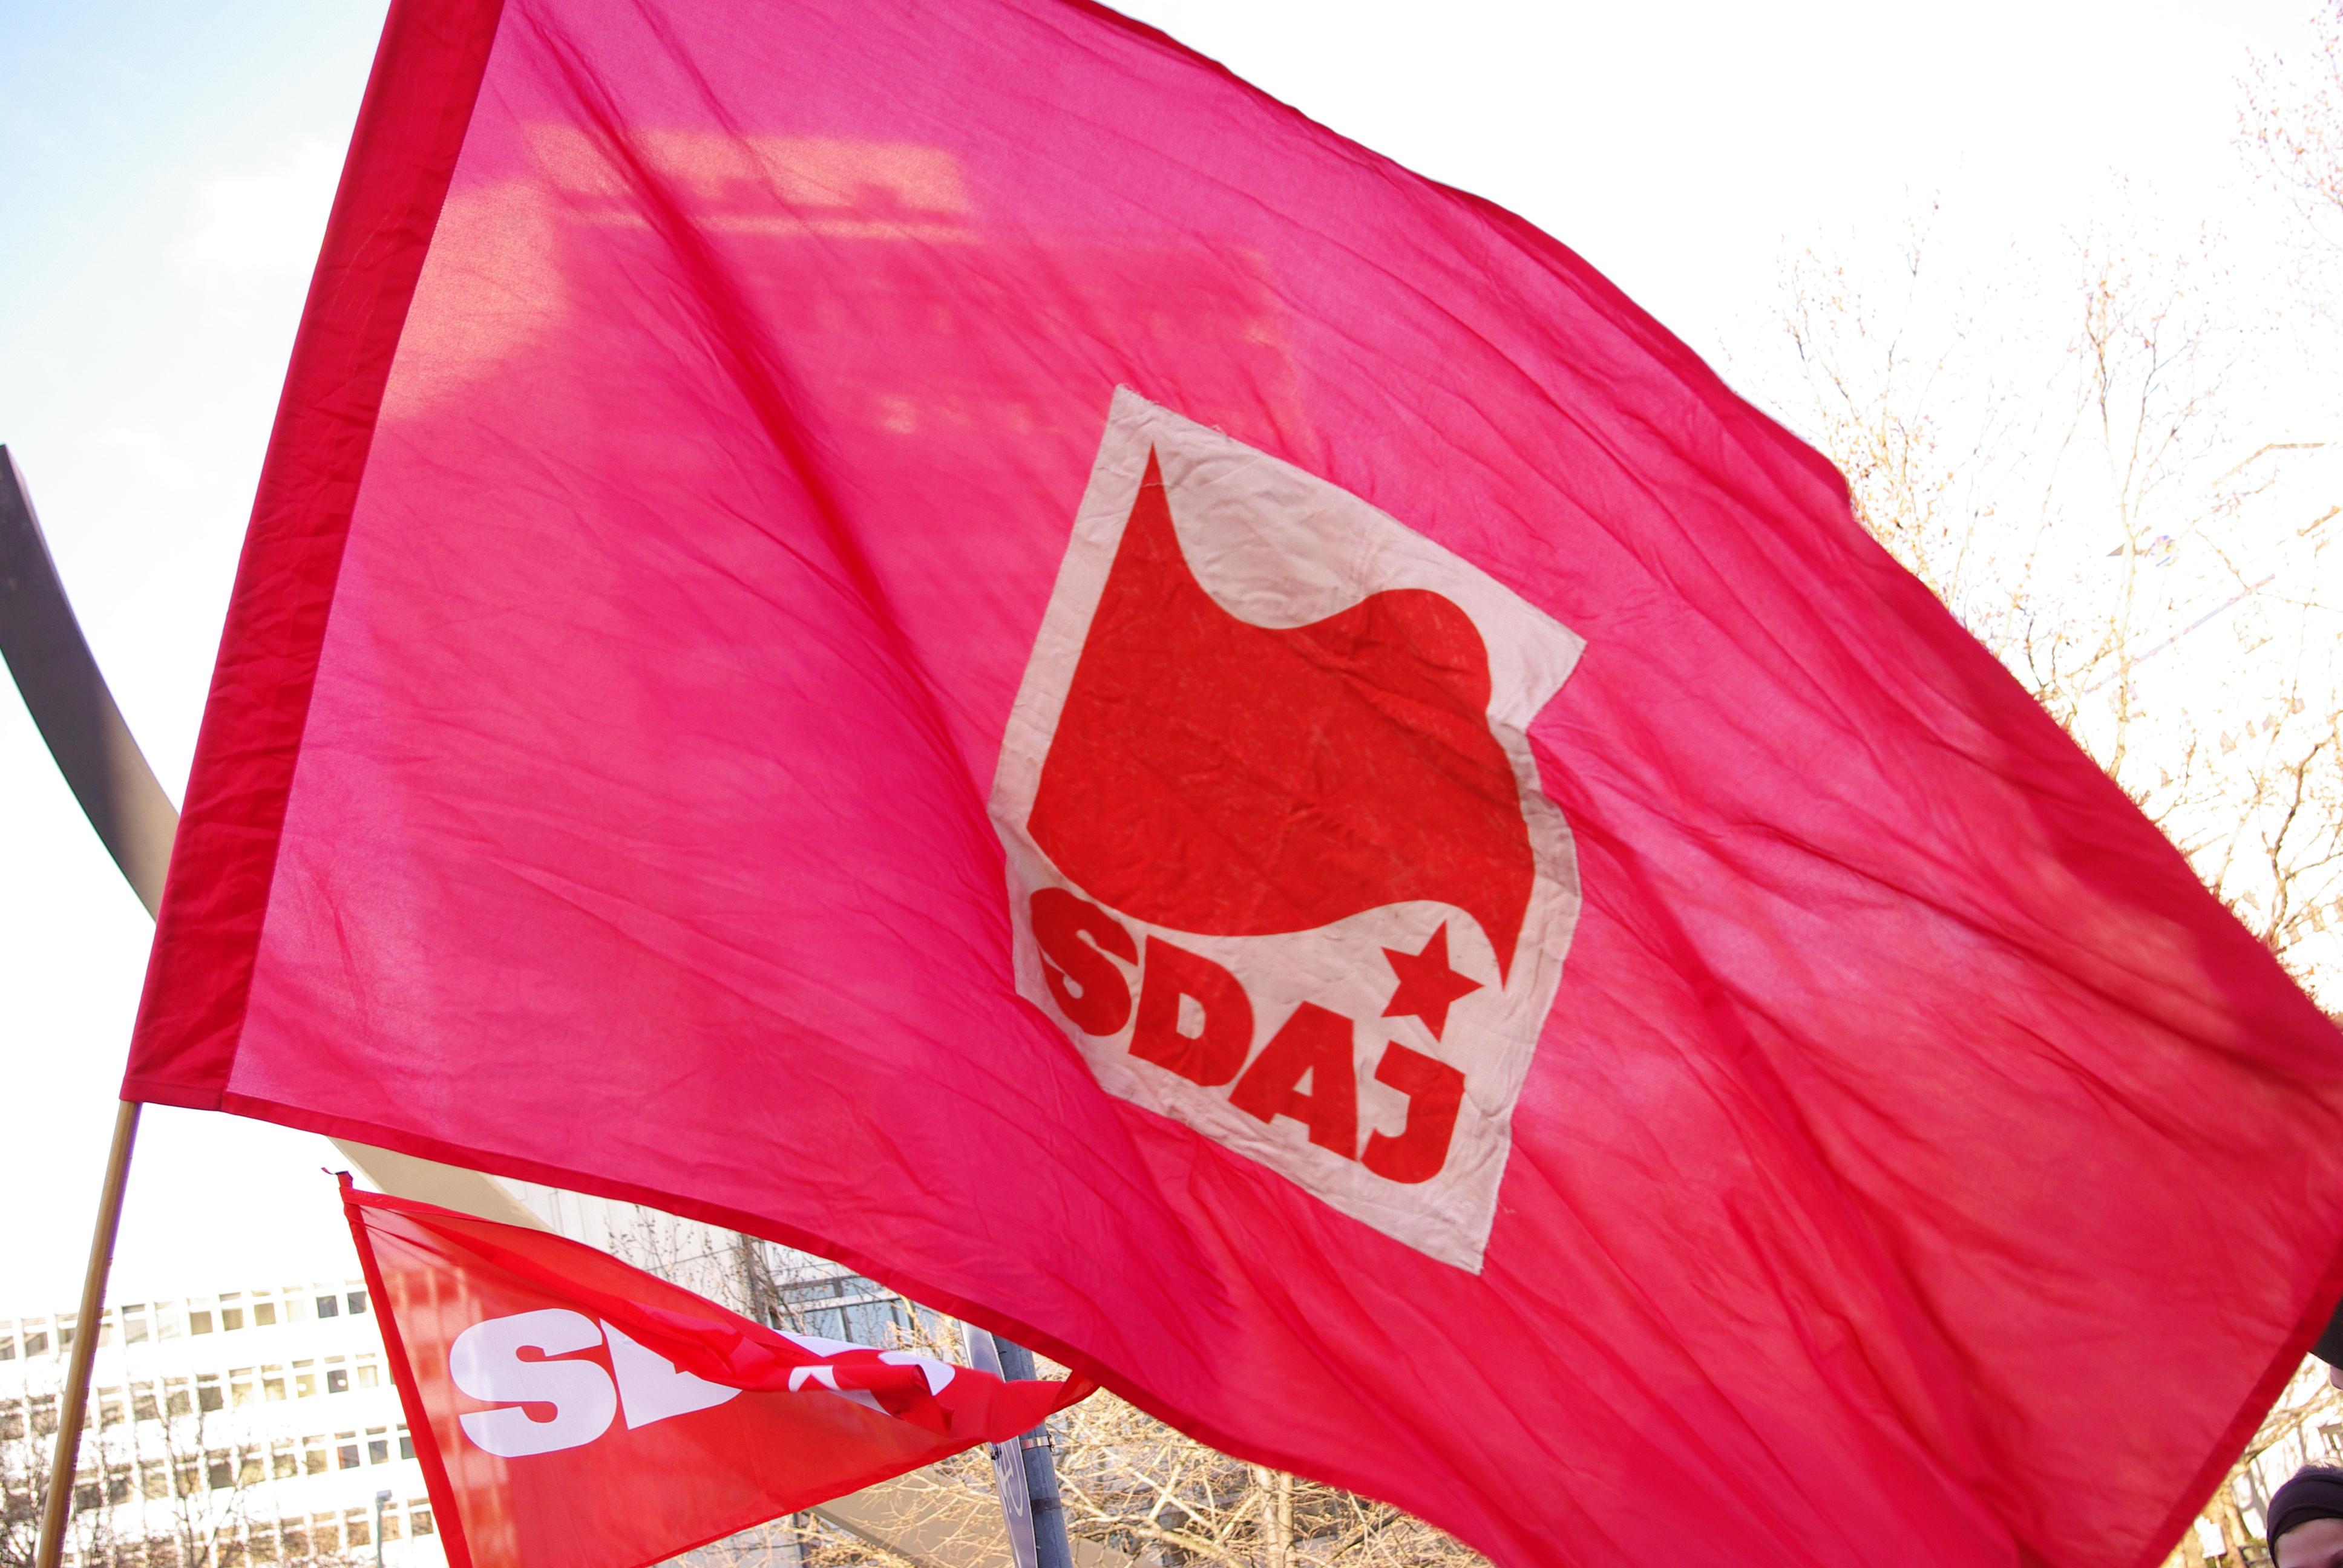 XIX. Bundeskongress der SDAJ: Jugend gegen die Krise